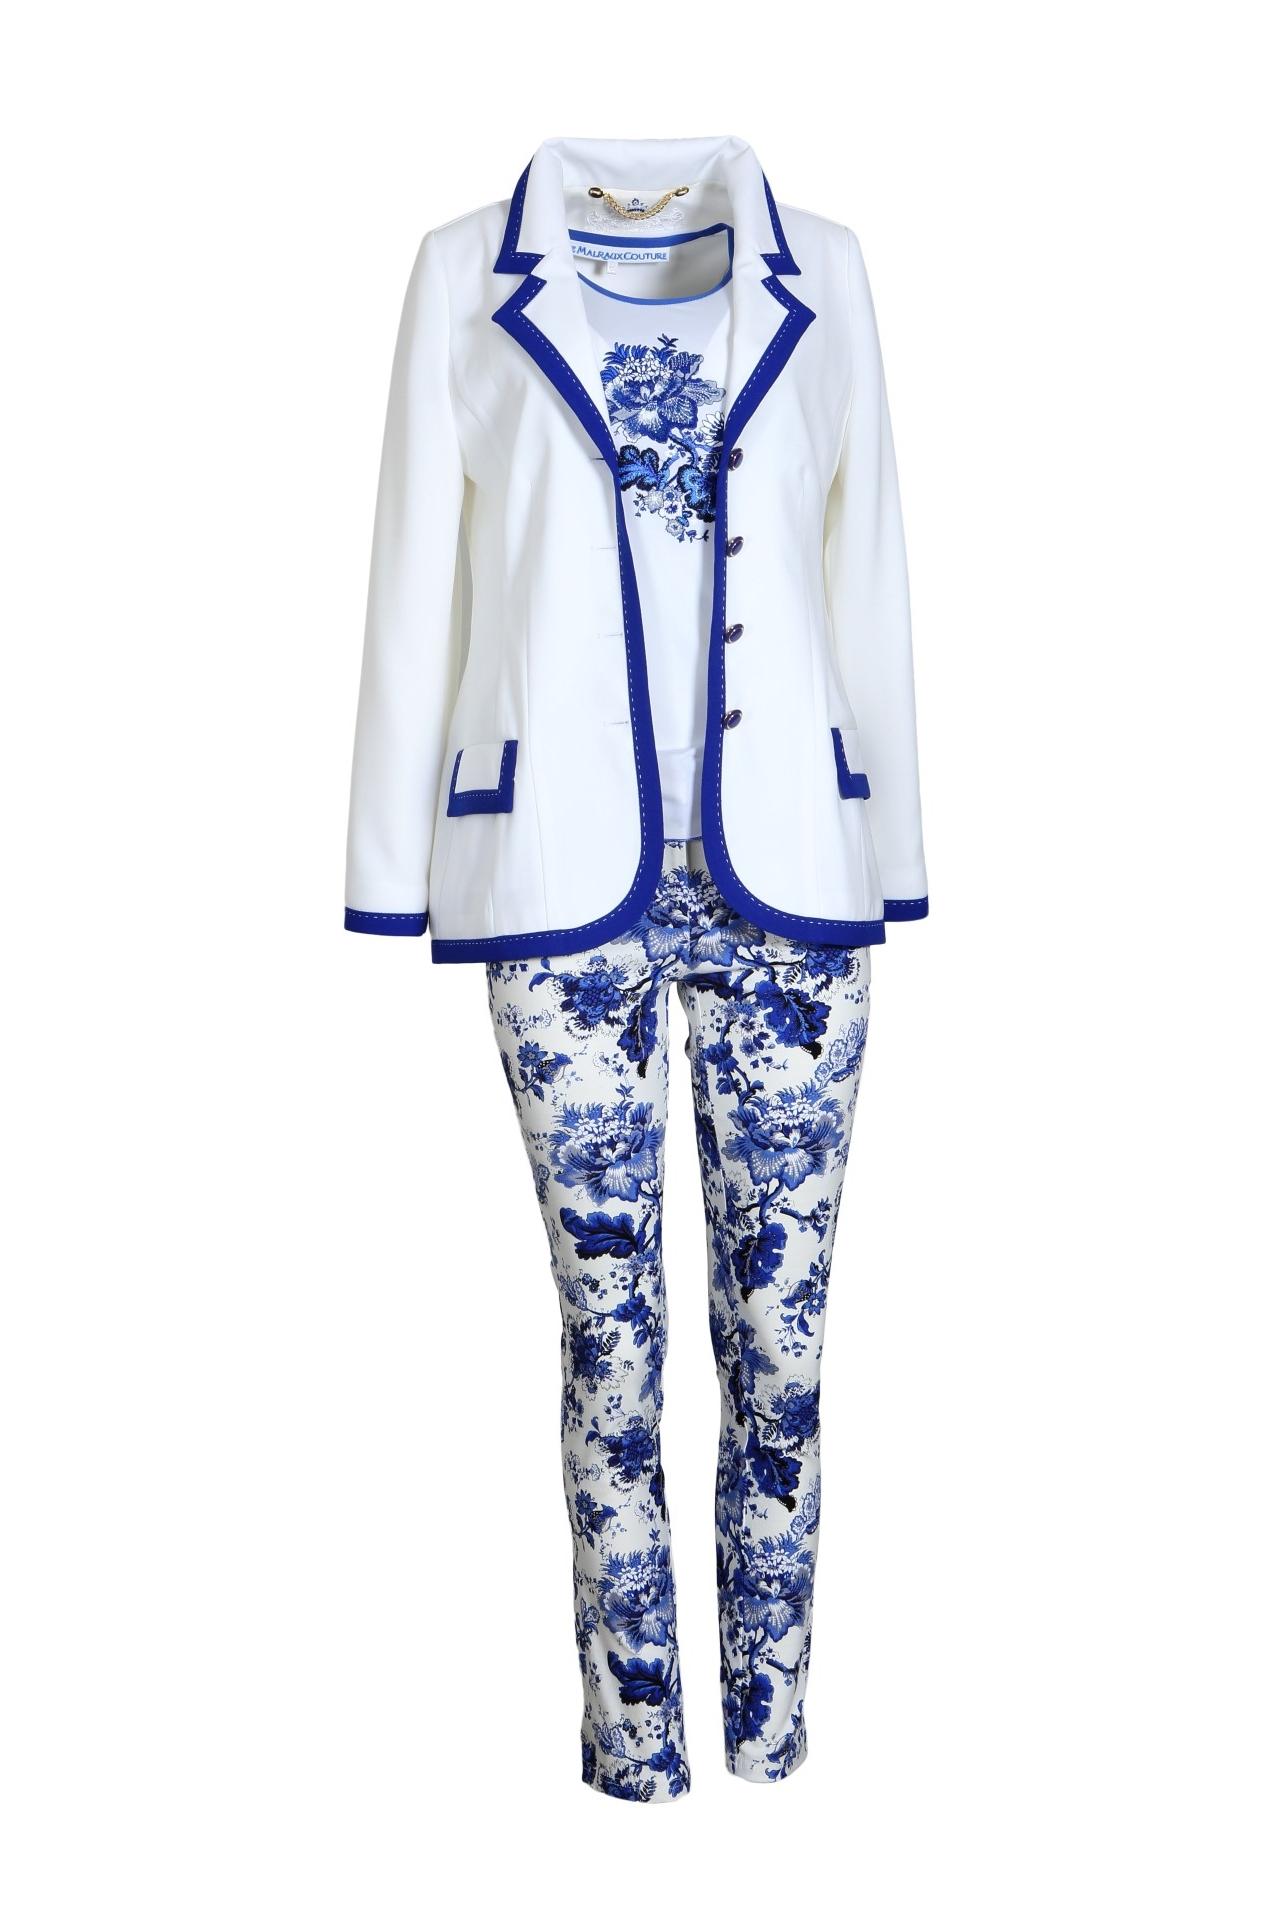 Longblazer, ecru royal blue, set in block contrast